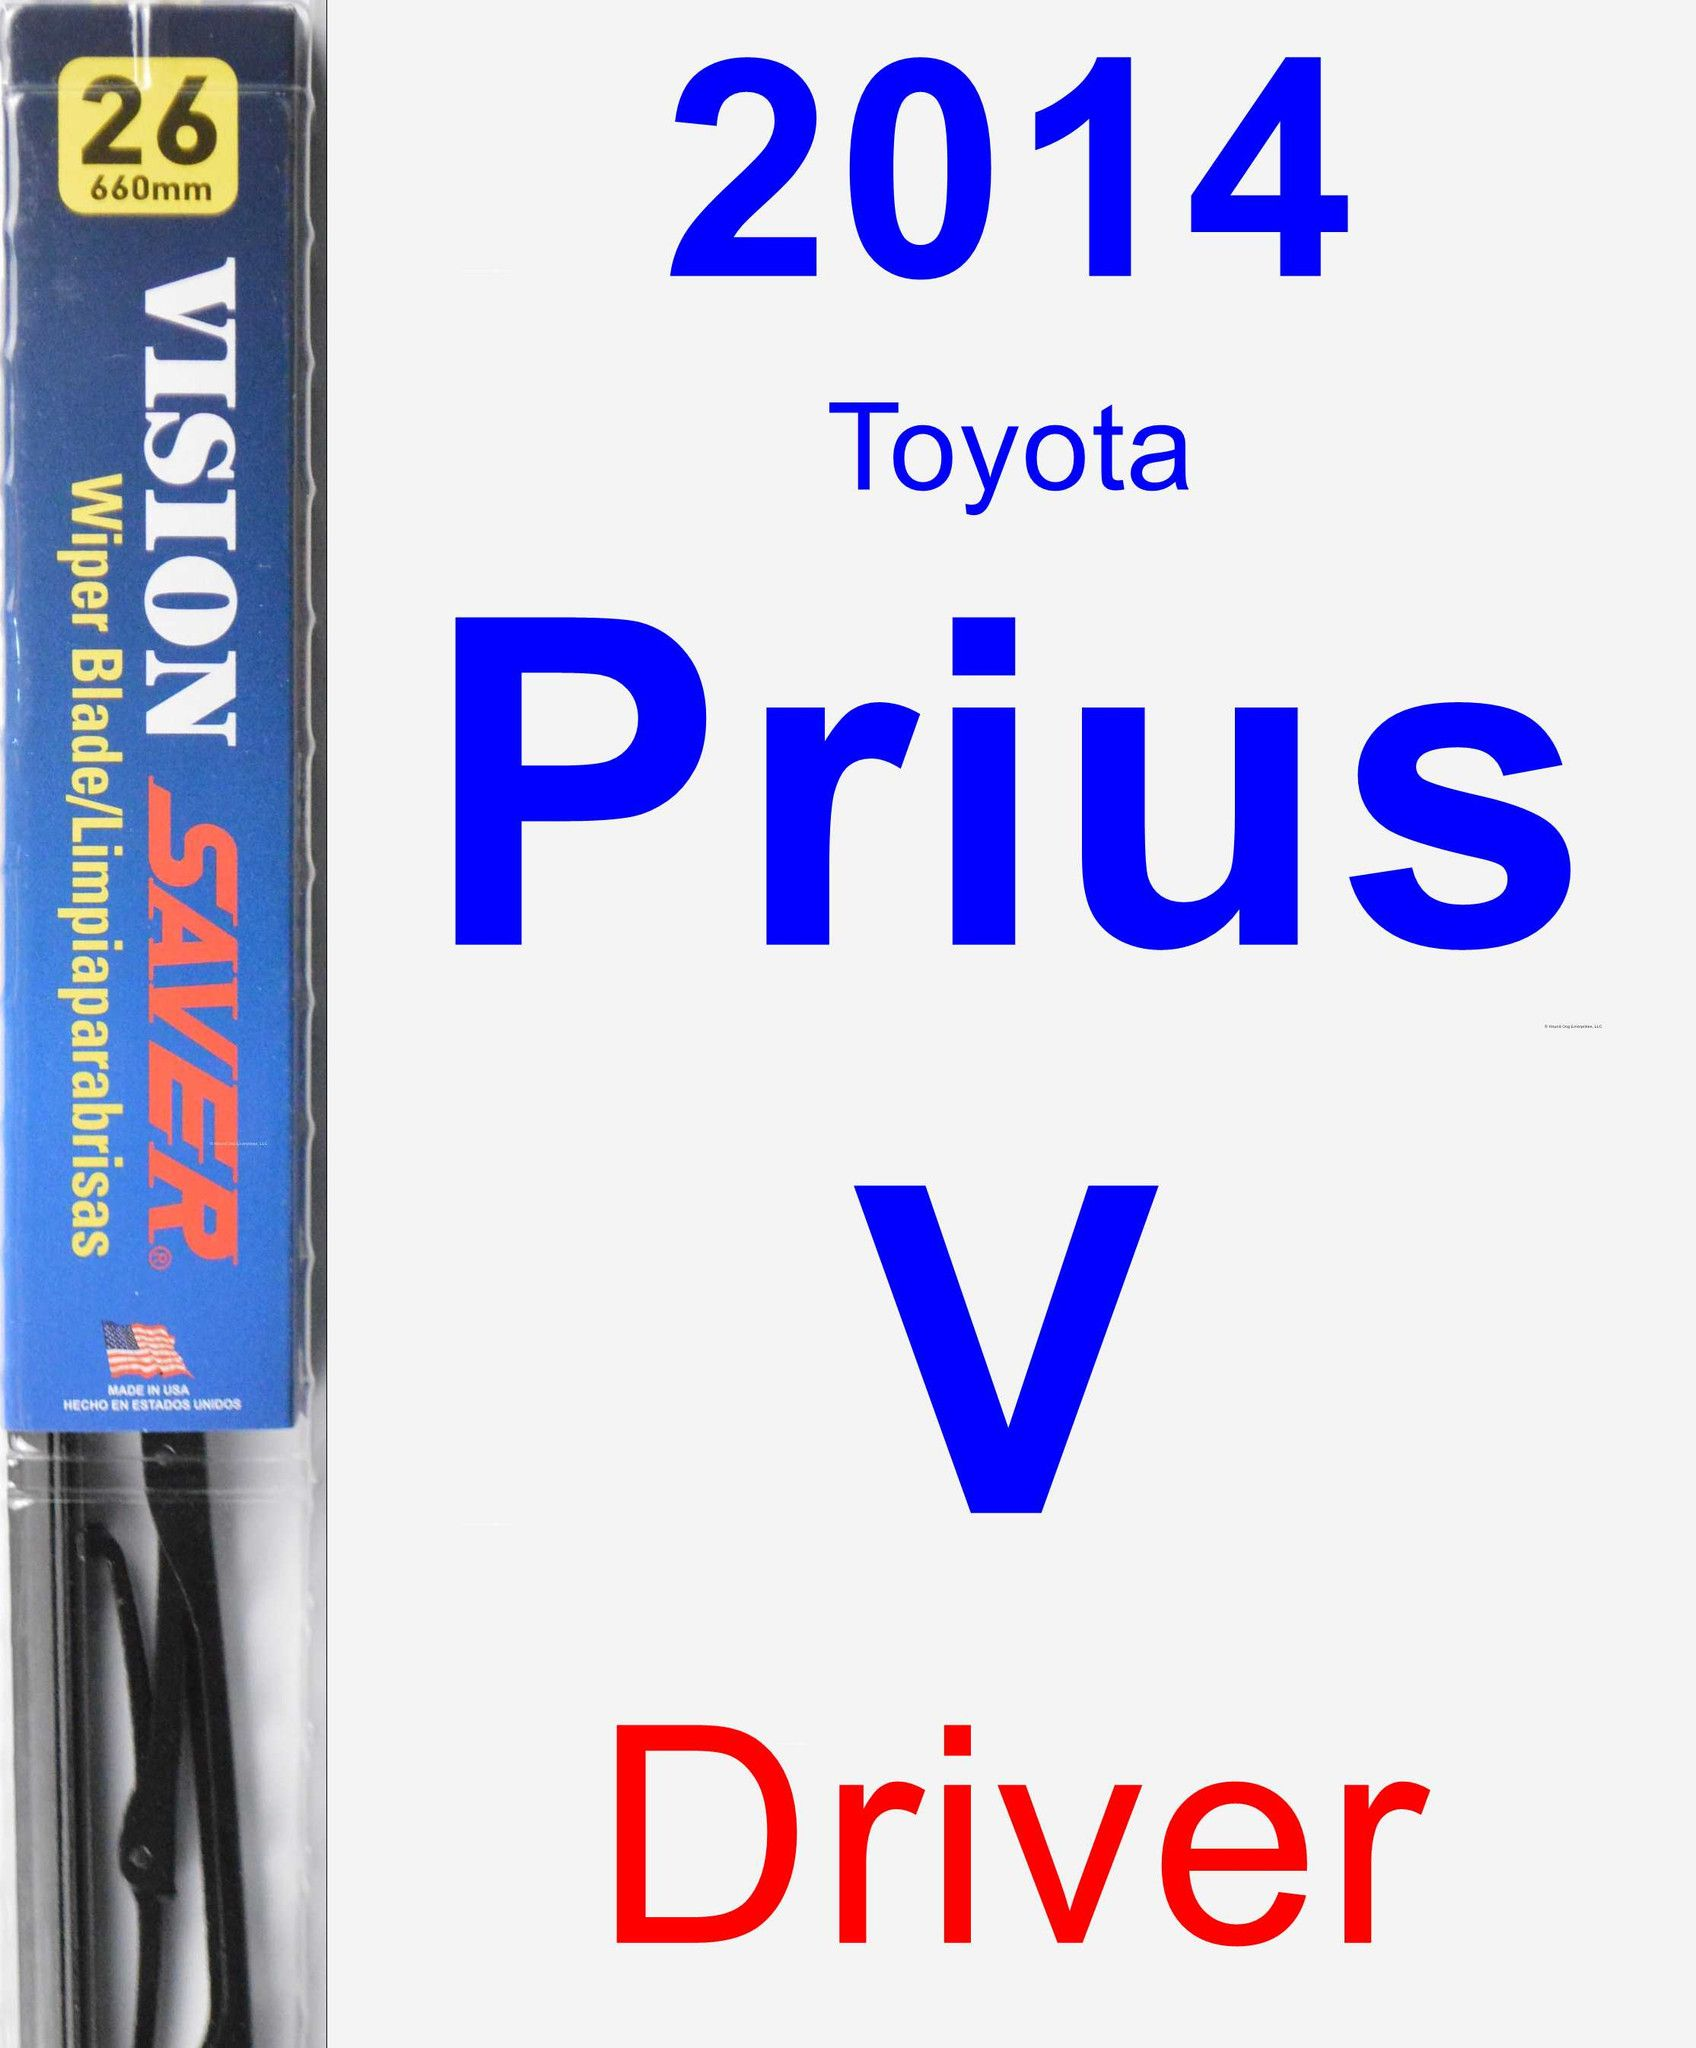 Driver Wiper Blade For 2014 Toyota Prius V Vision Saver Toyota